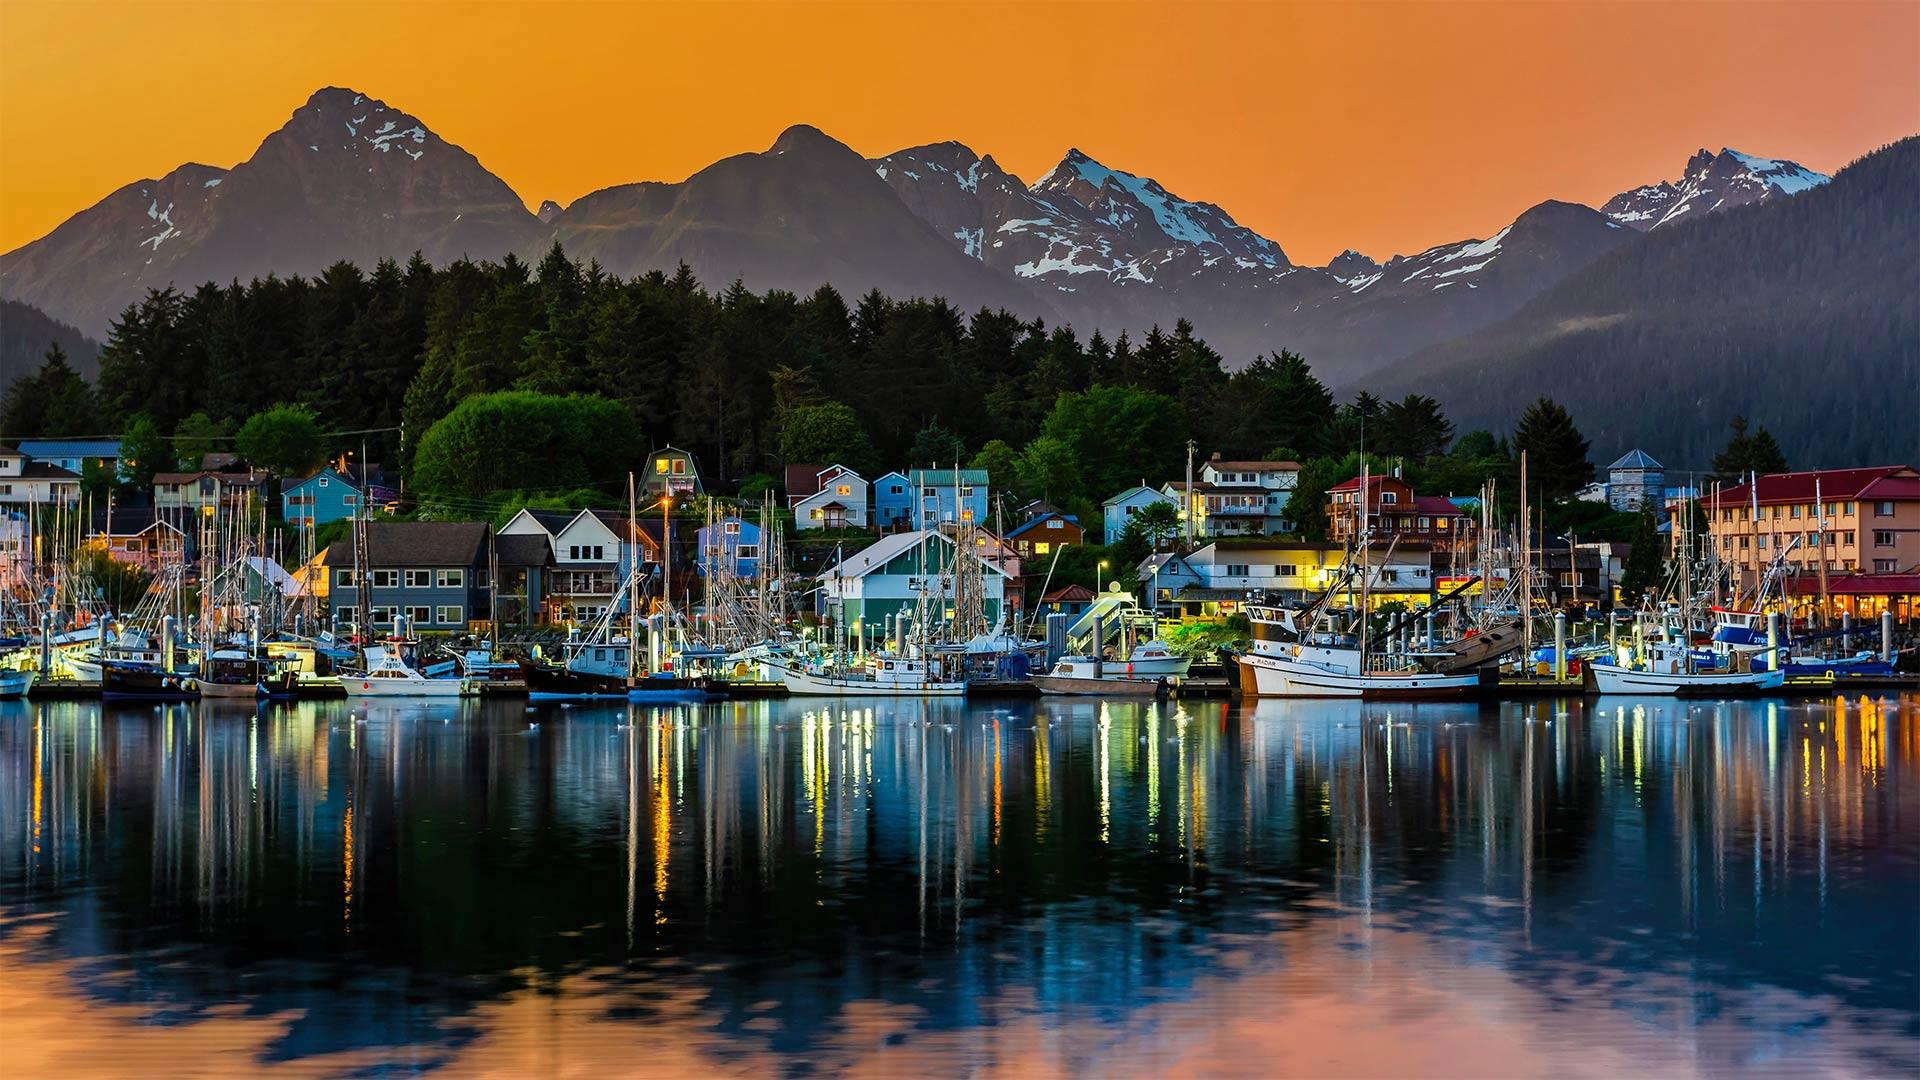 View of the harbor in Sitka, Alaska (© Blaine Harrington III/Alamy)(Bing United States)